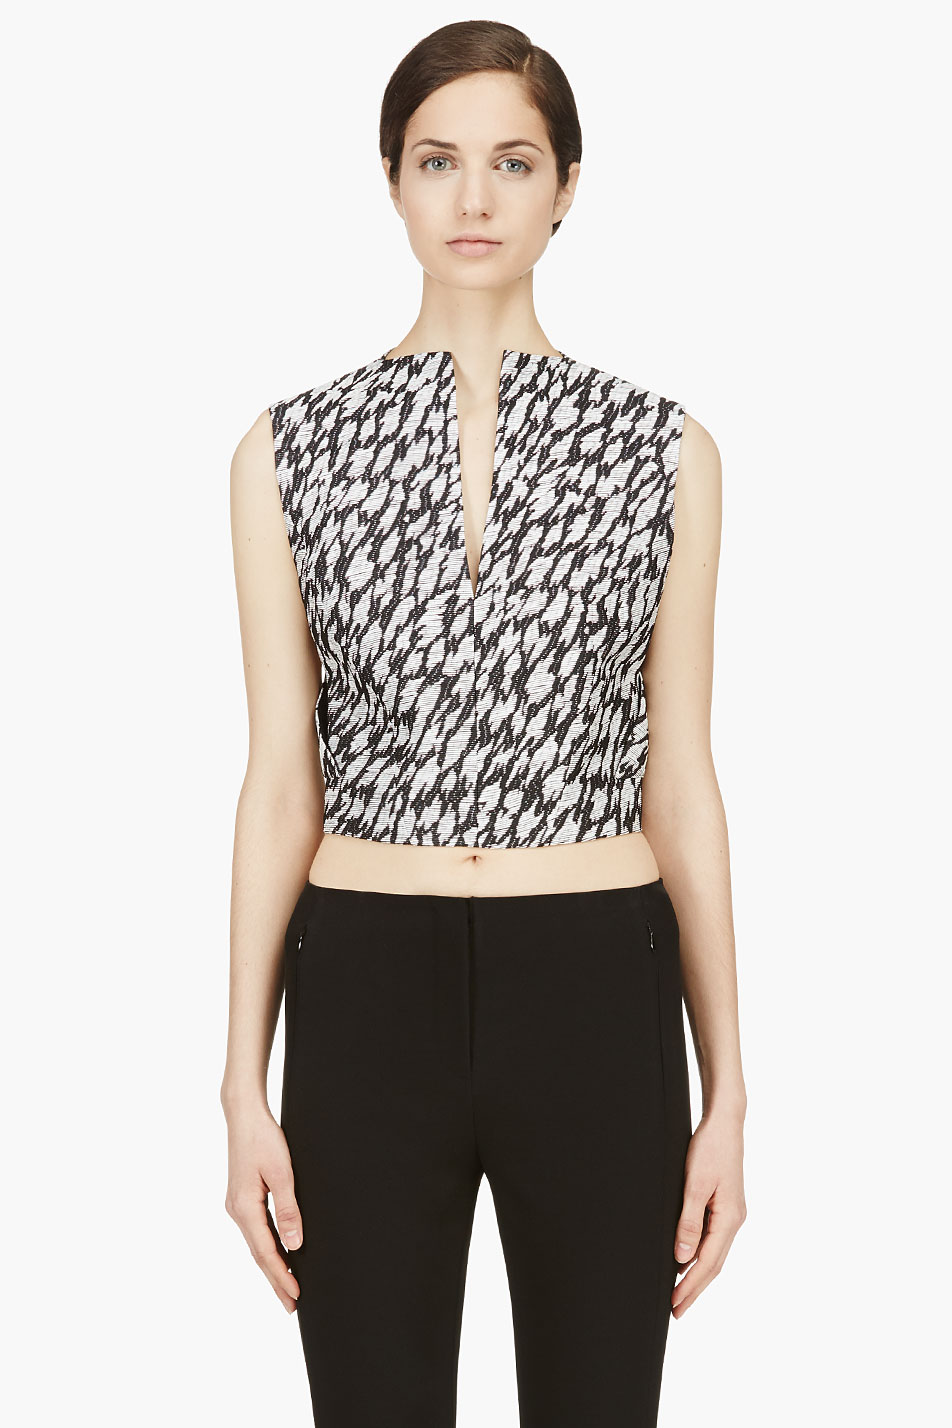 mugler black and white leopard jacquard crop top